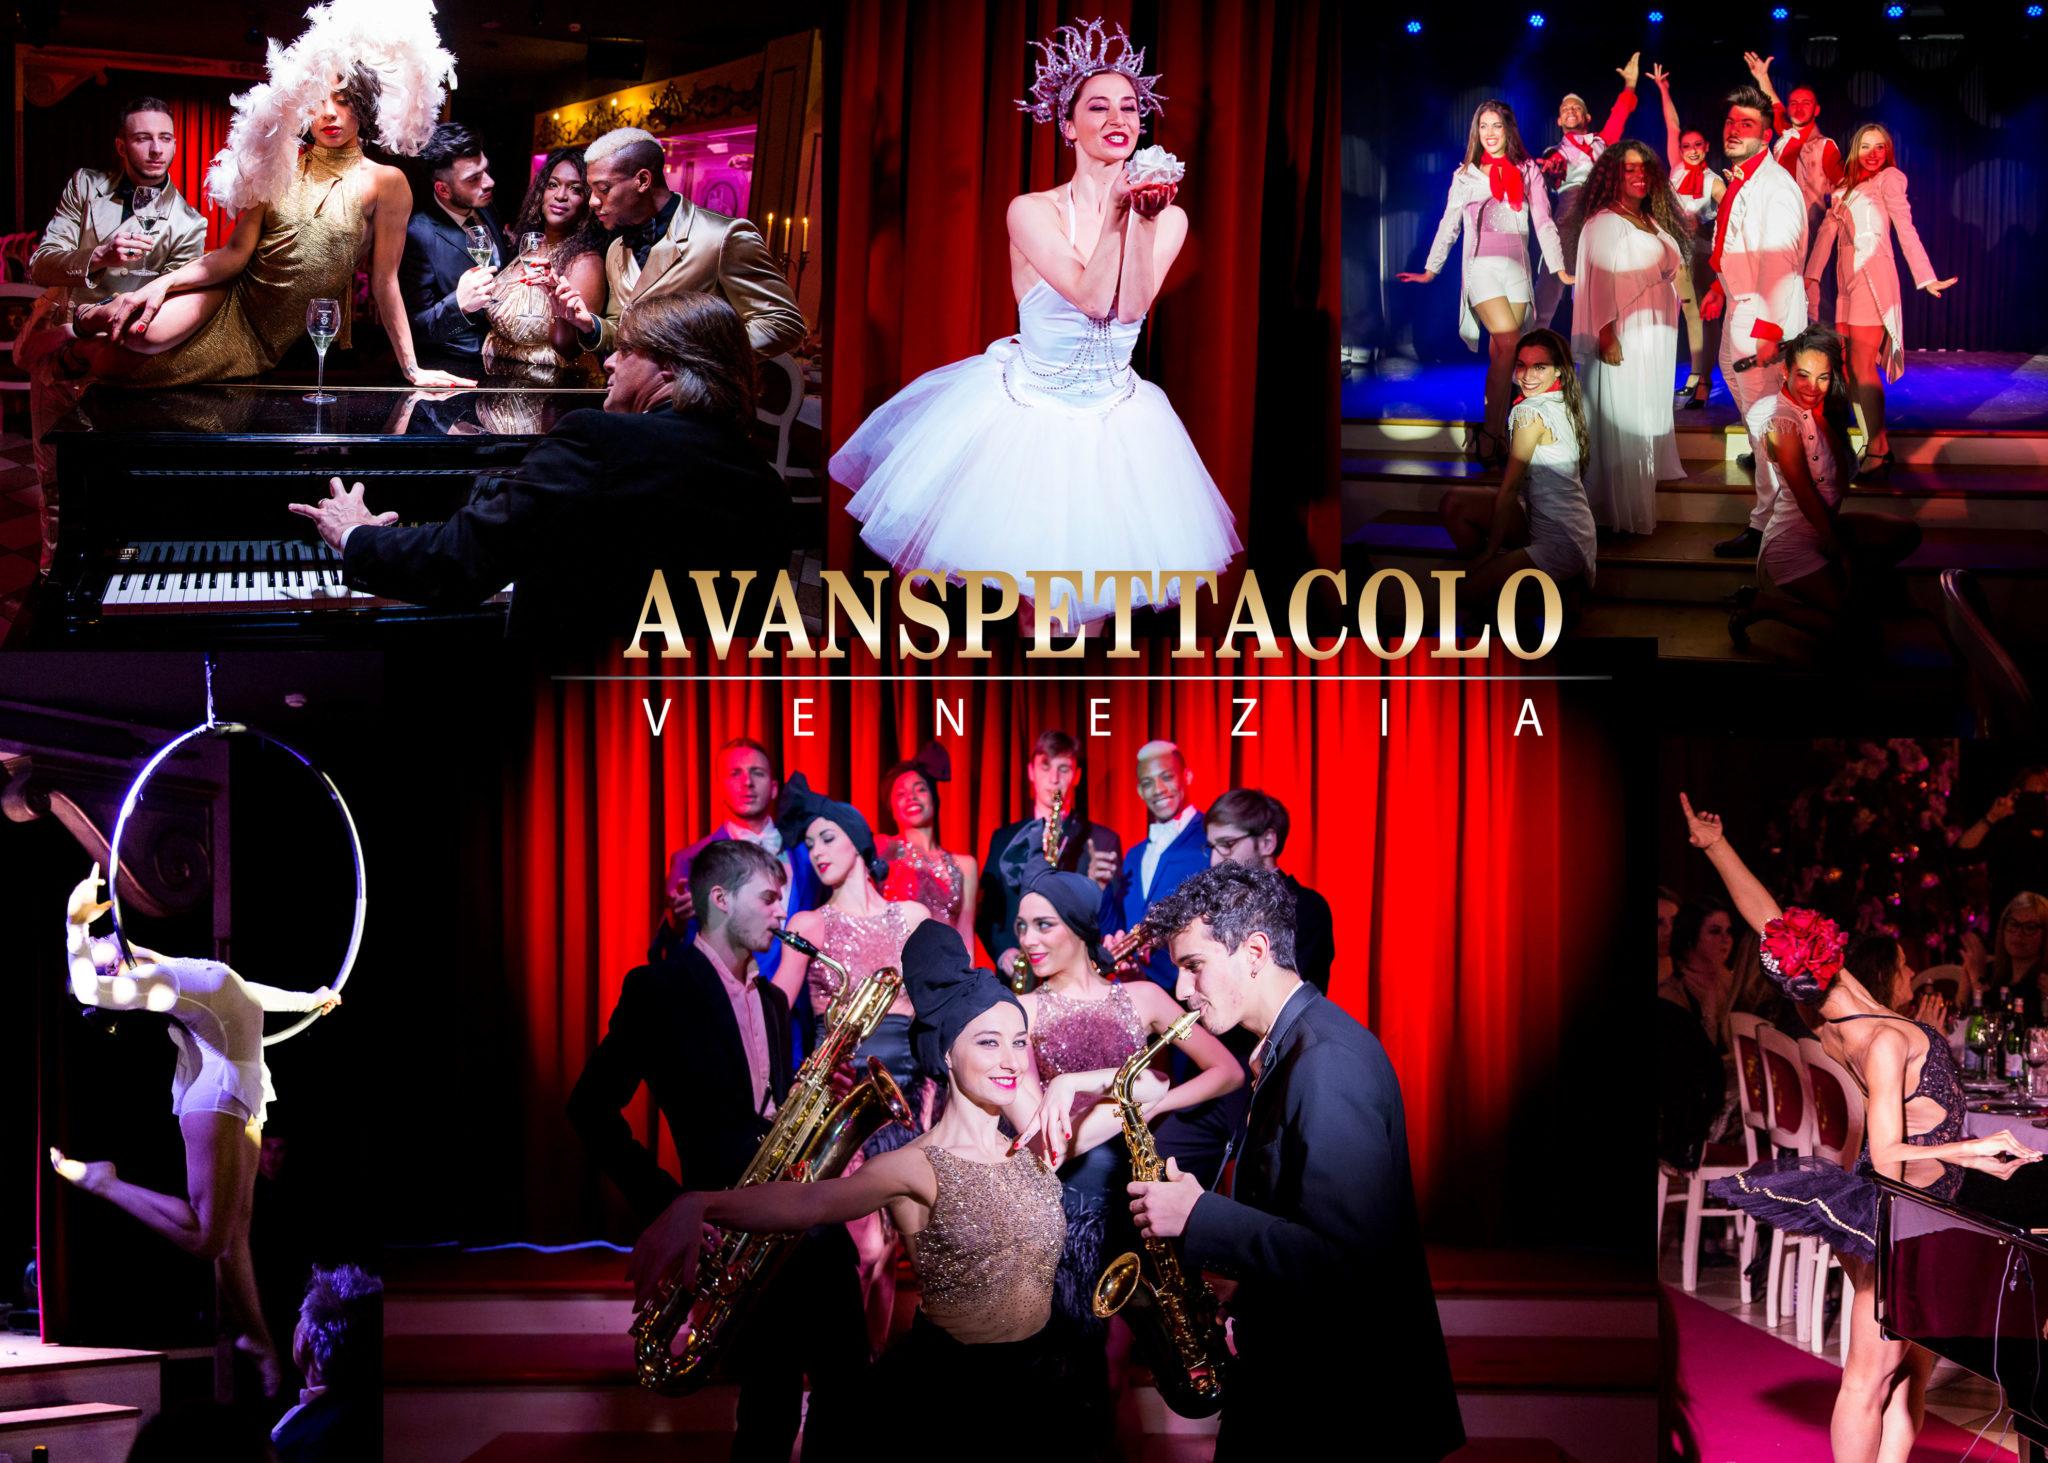 Grand Show Magic Avanspettacolo Venezia 1 1